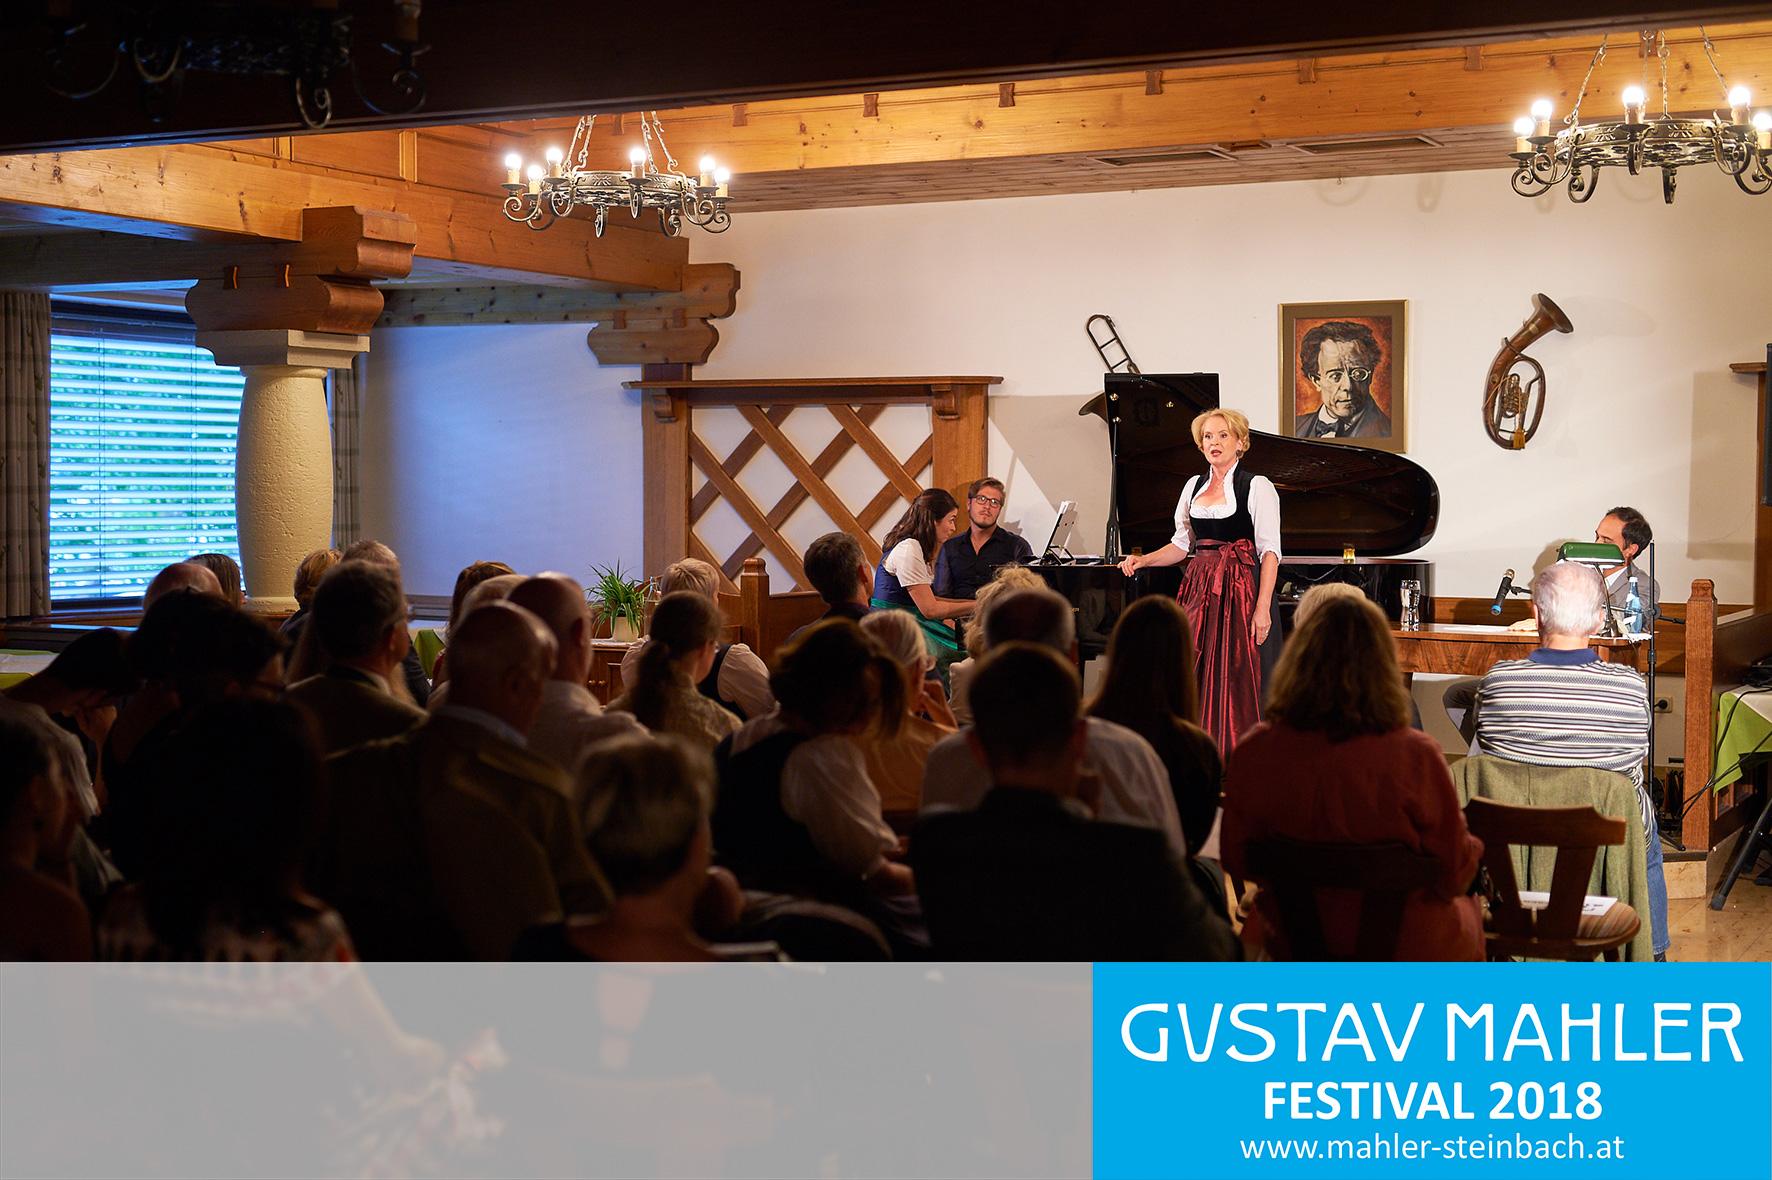 Mahler in Lied und Wort,  Eröfffnung 3. Gustav Mahler Festival